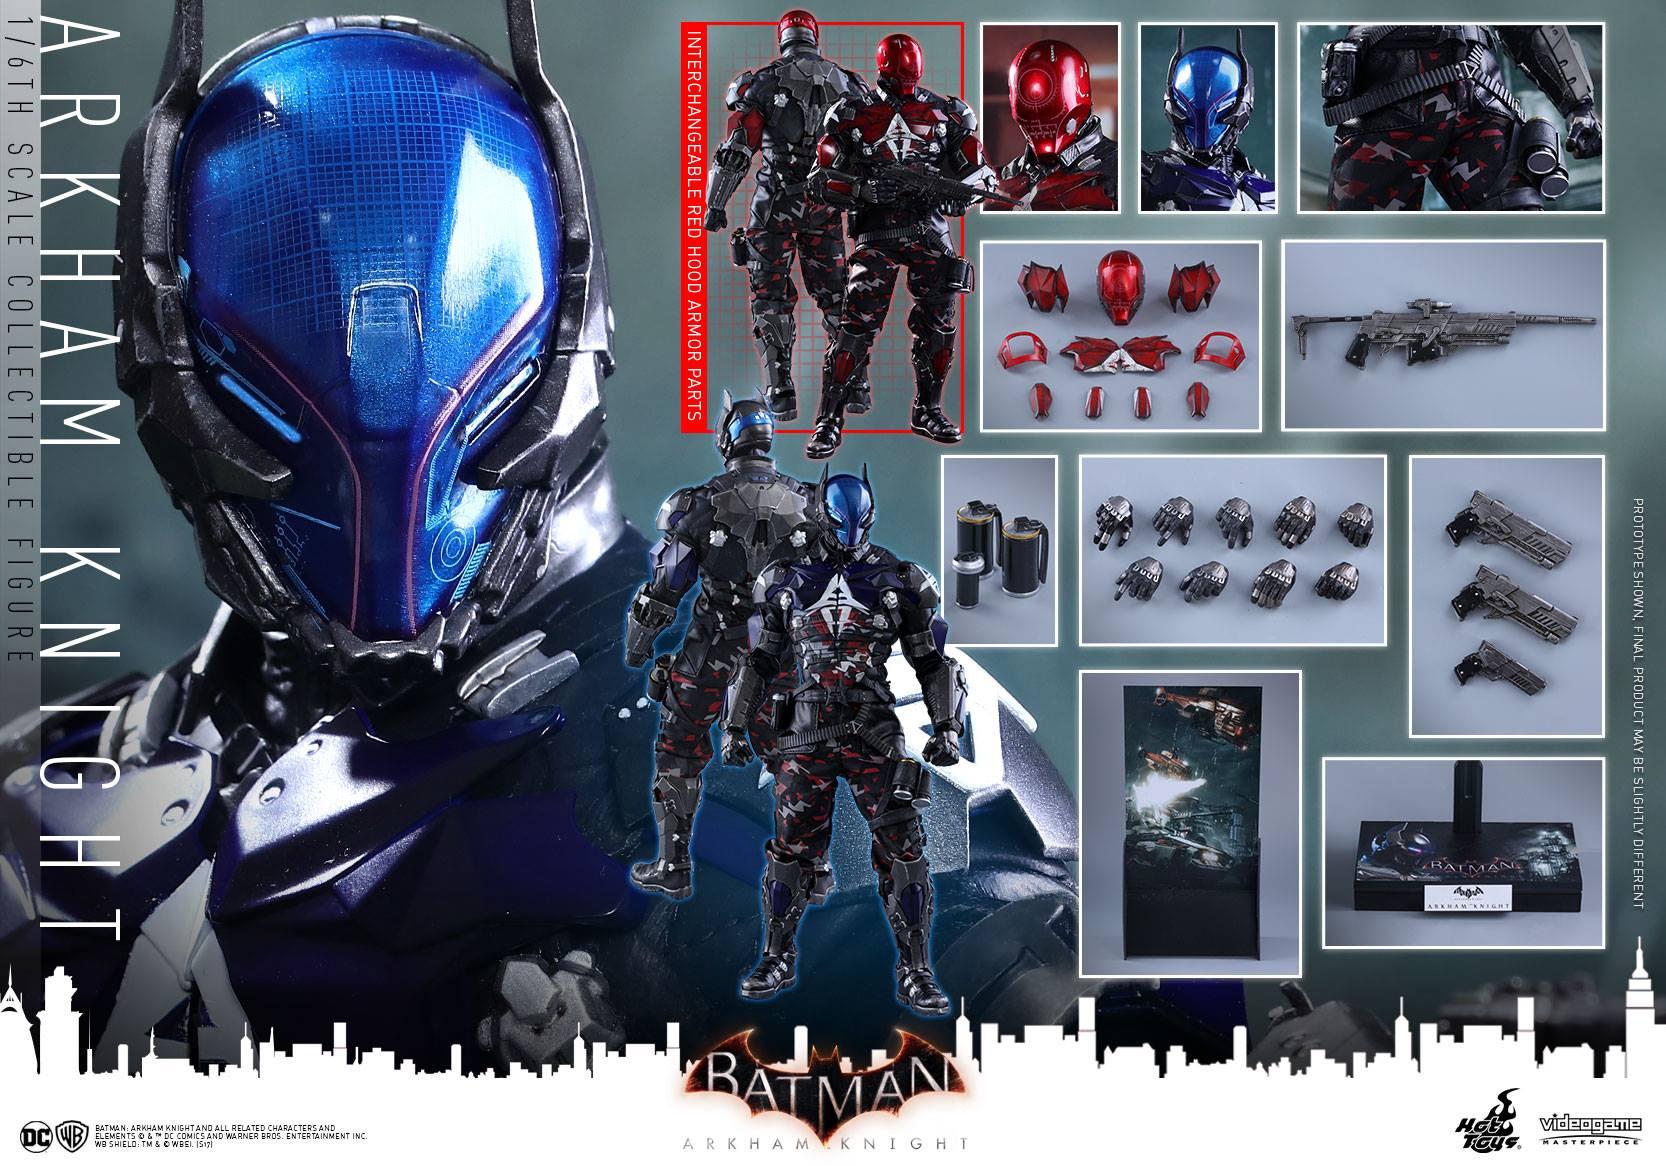 Prime 1 Studio Batman: Arkham Knight Sixth Scale Figure Pre-Orders